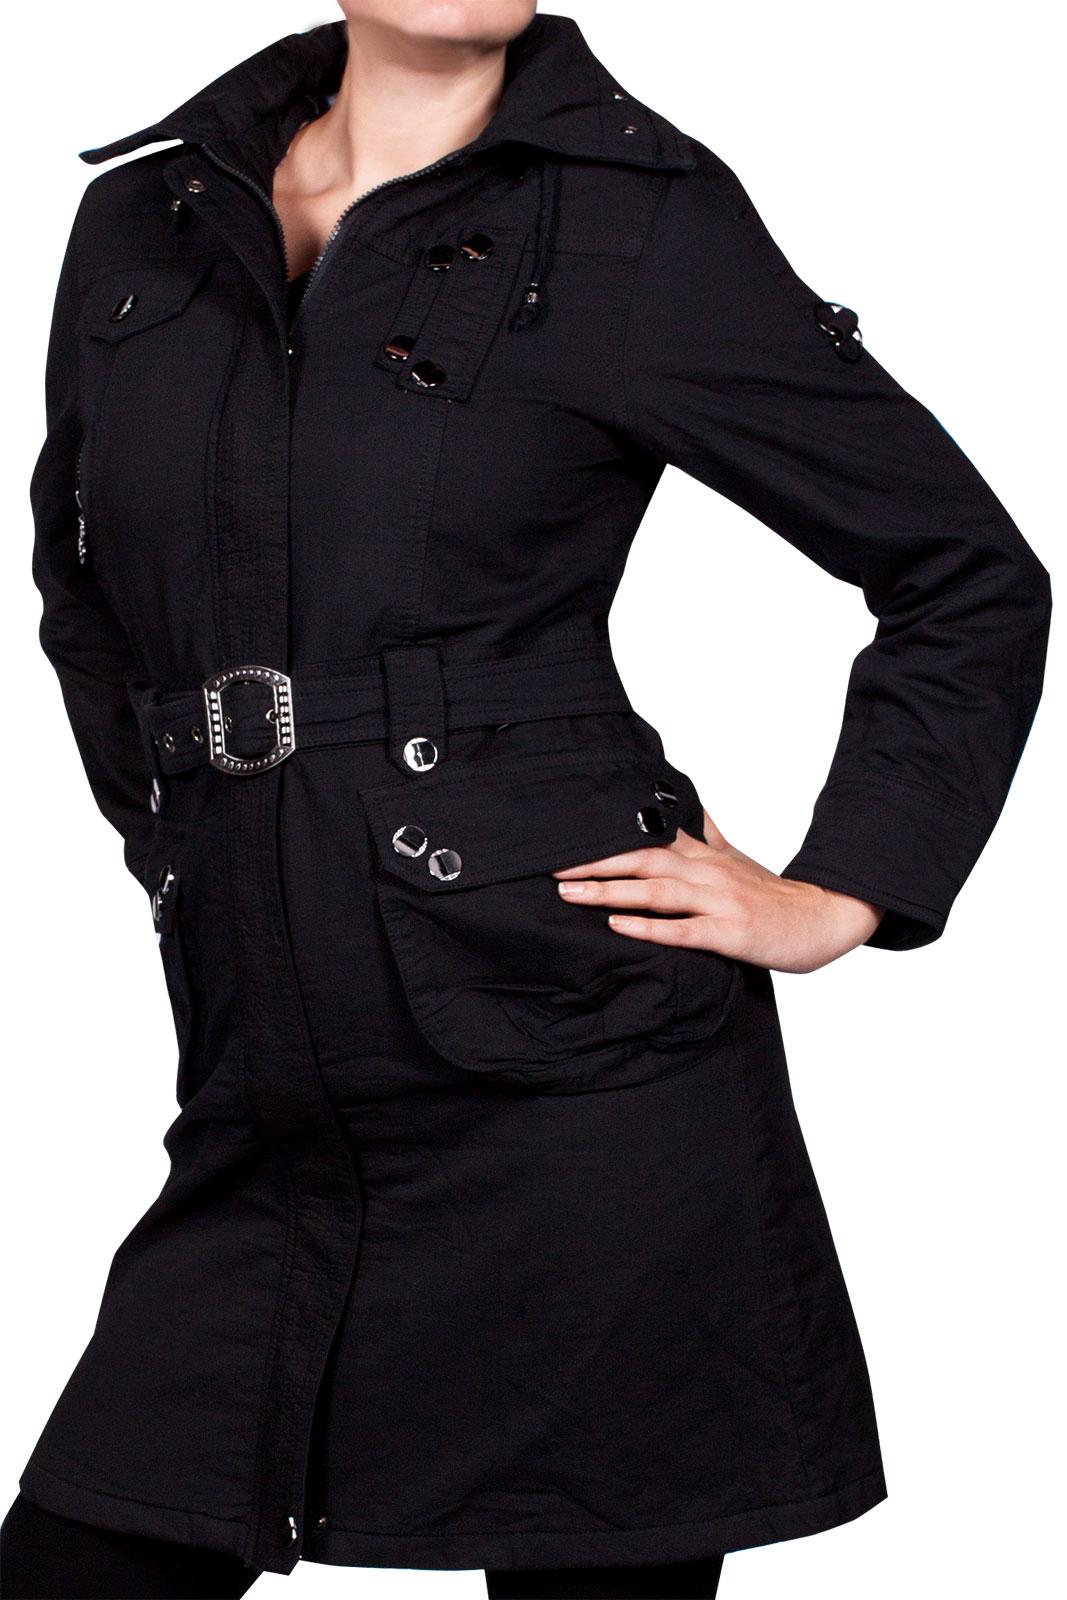 luxus damen wintermantel warm jacke lang cotton mantel. Black Bedroom Furniture Sets. Home Design Ideas